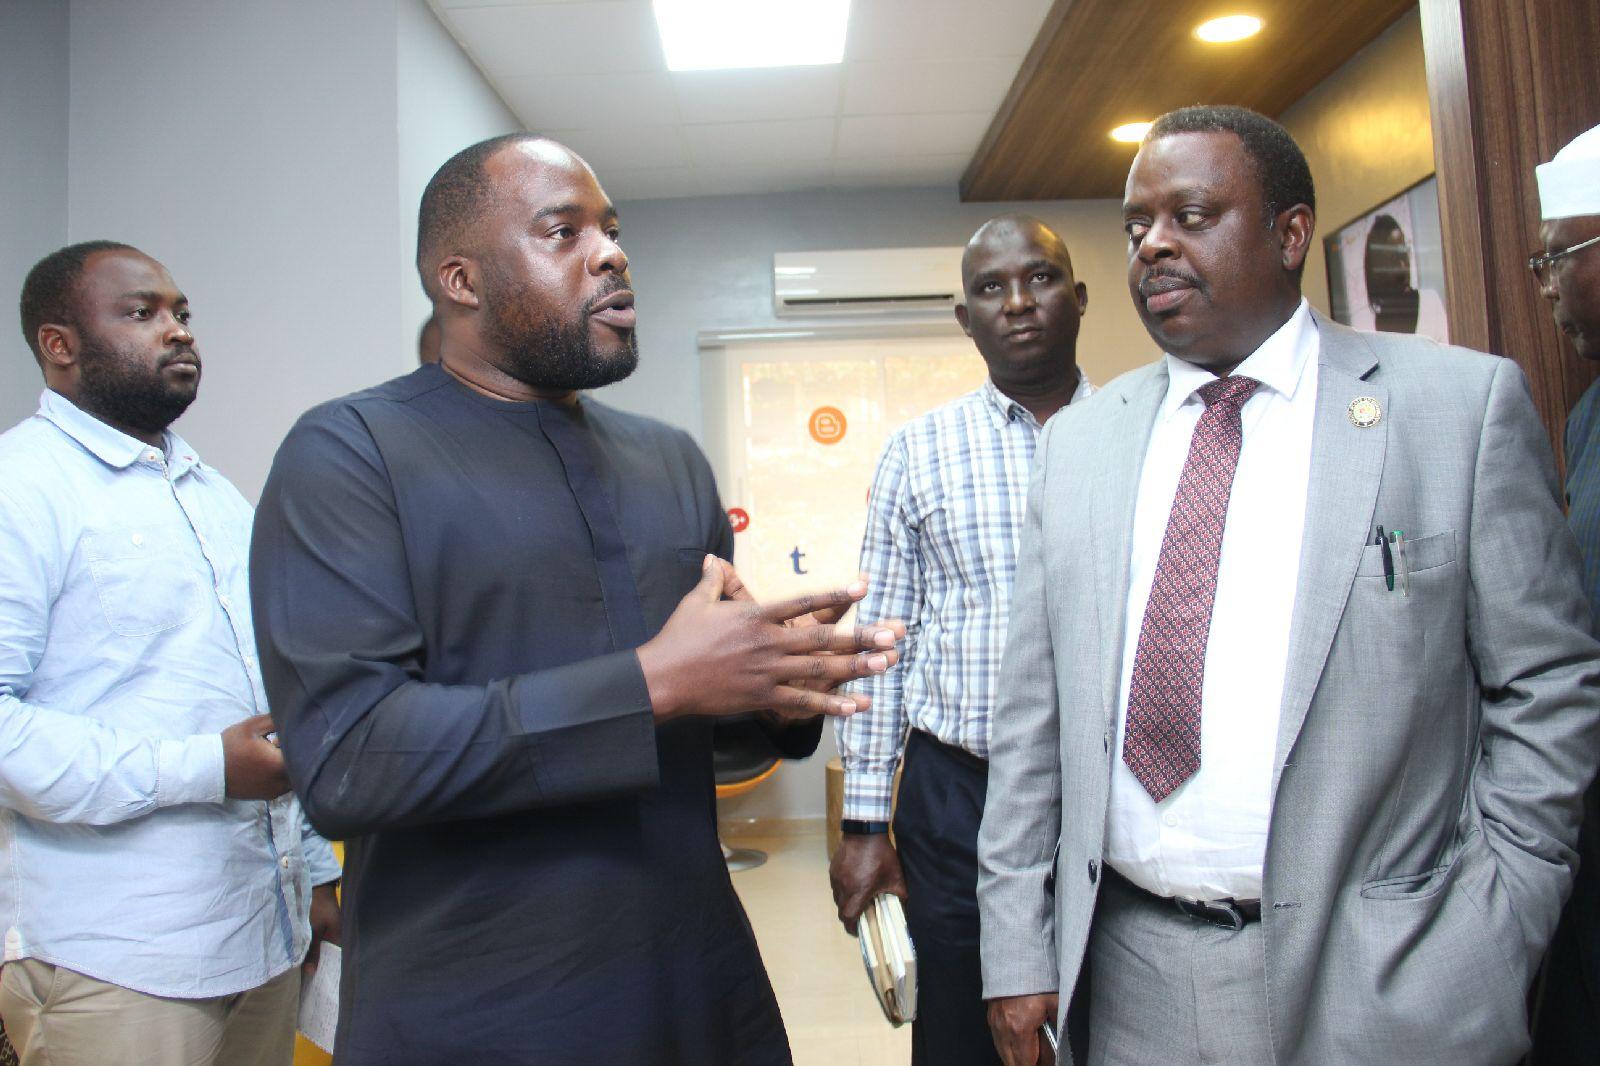 Lagos Embraces e- Experience Solution <br> By Sampson Unamka